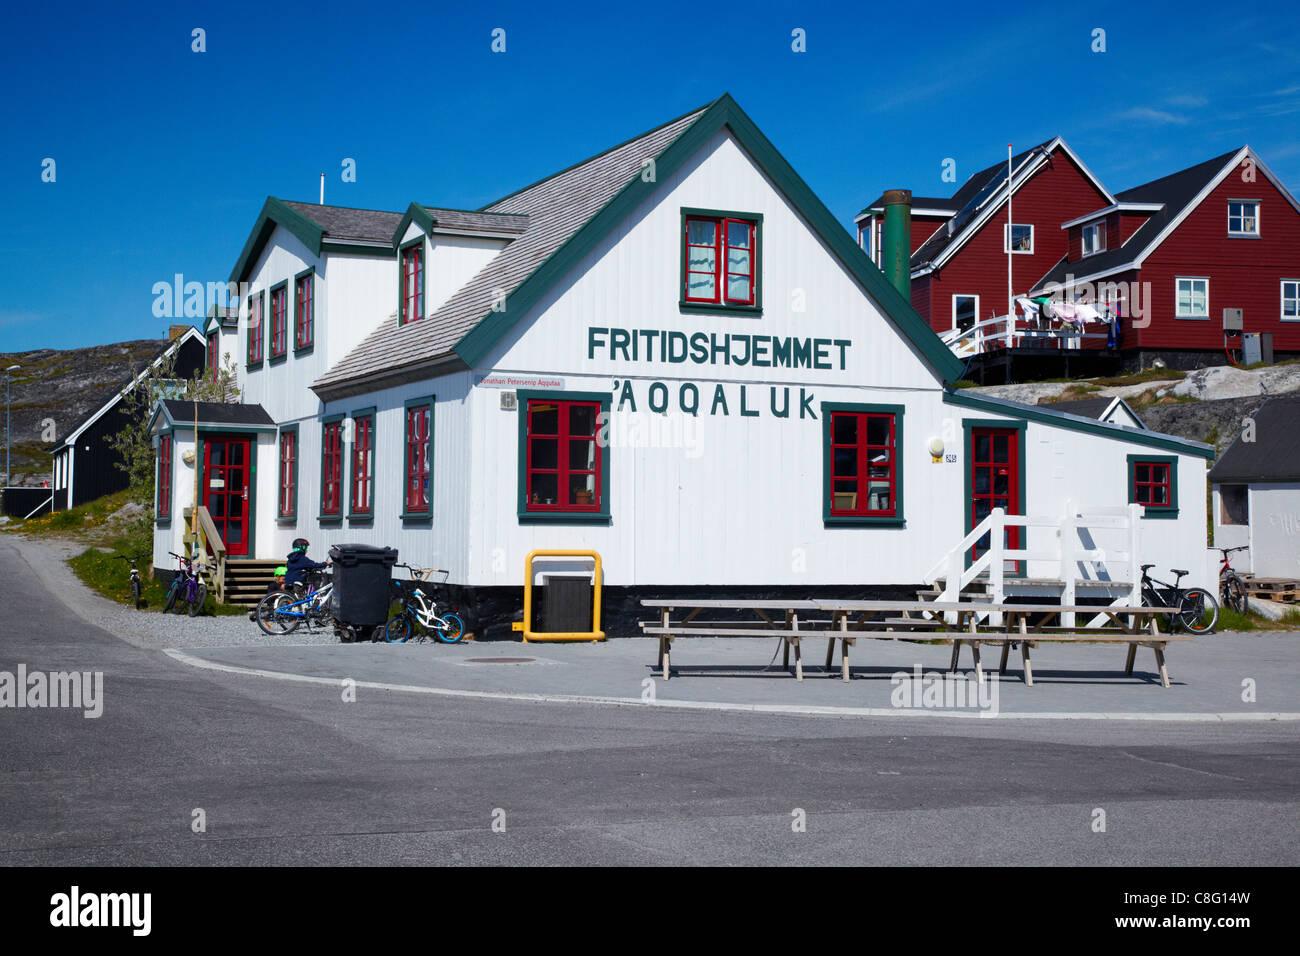 Fritidshjemmet Aqqaluk (Kindergarten), Nuuk, Greenland - Stock Image